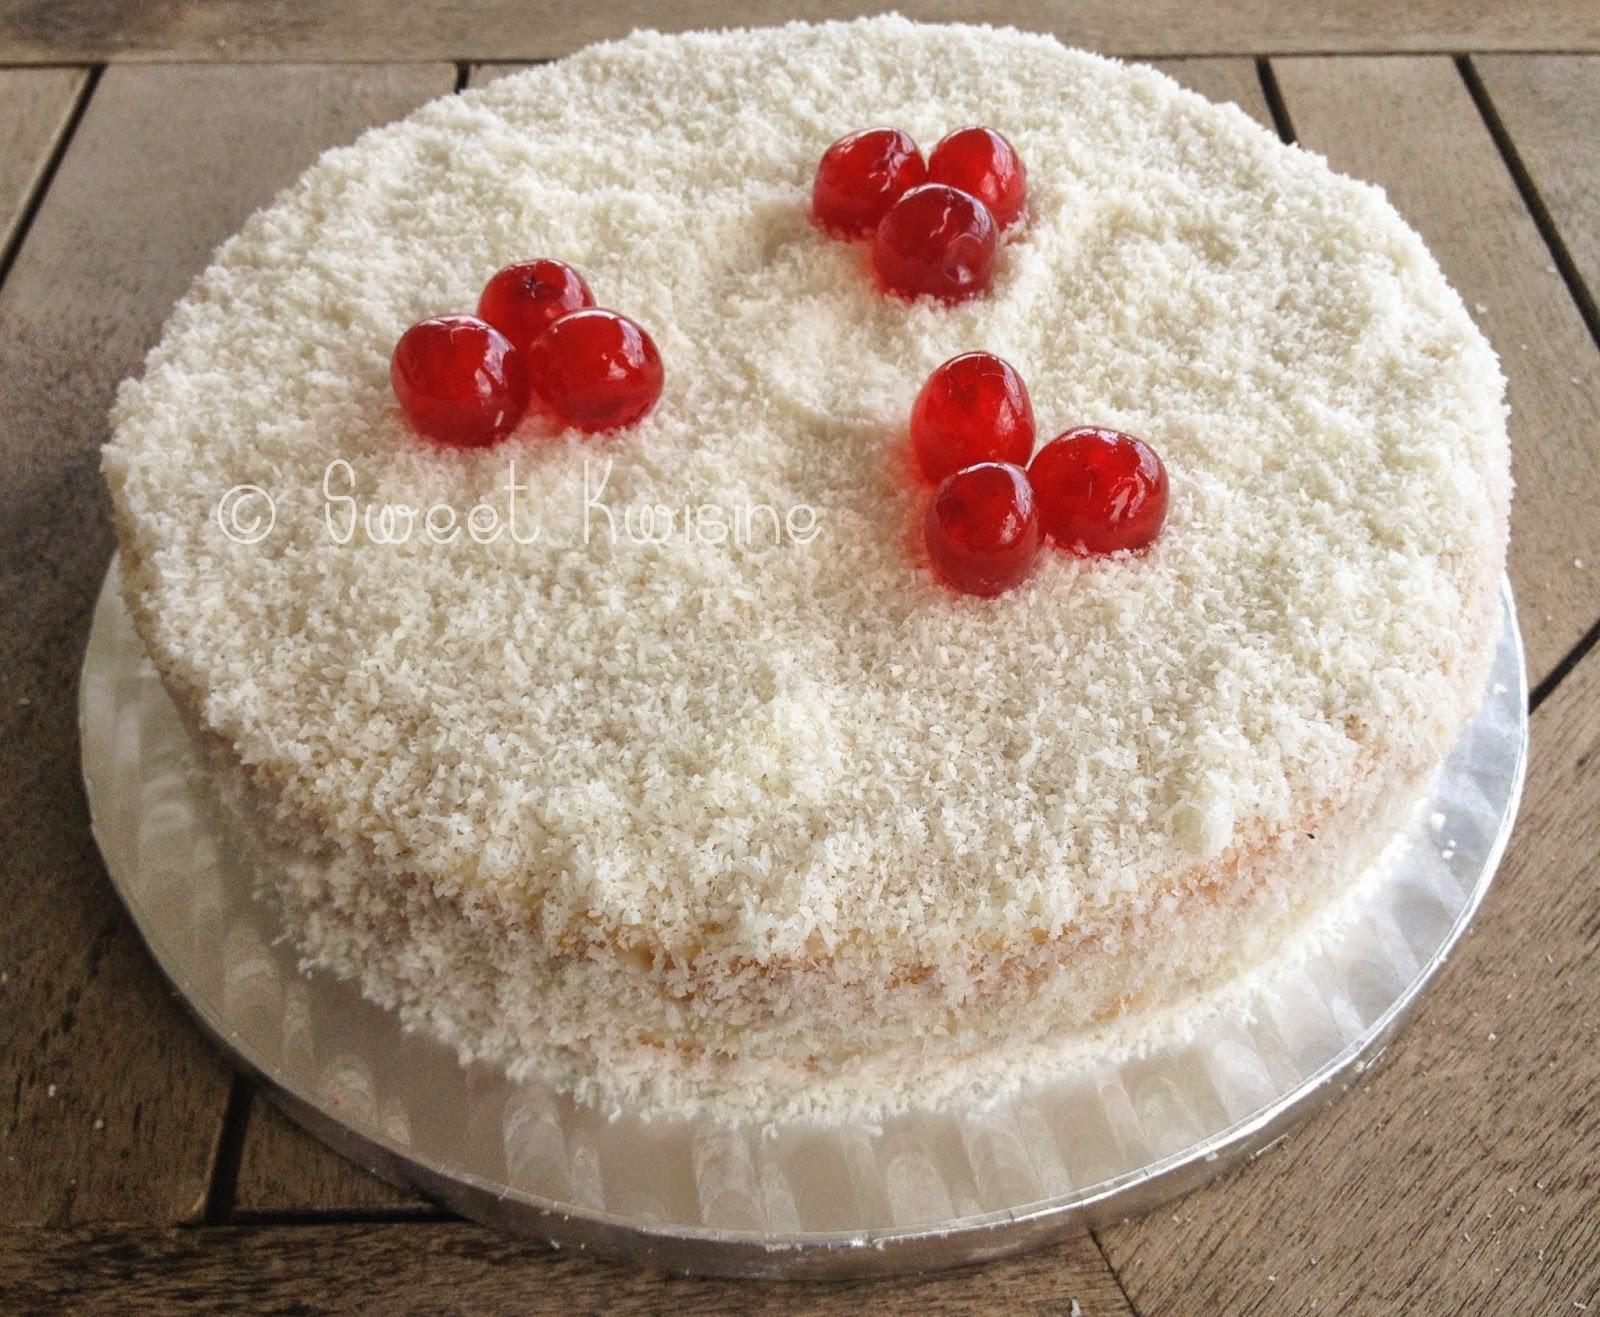 sweet kwisine le mont blanc au coco